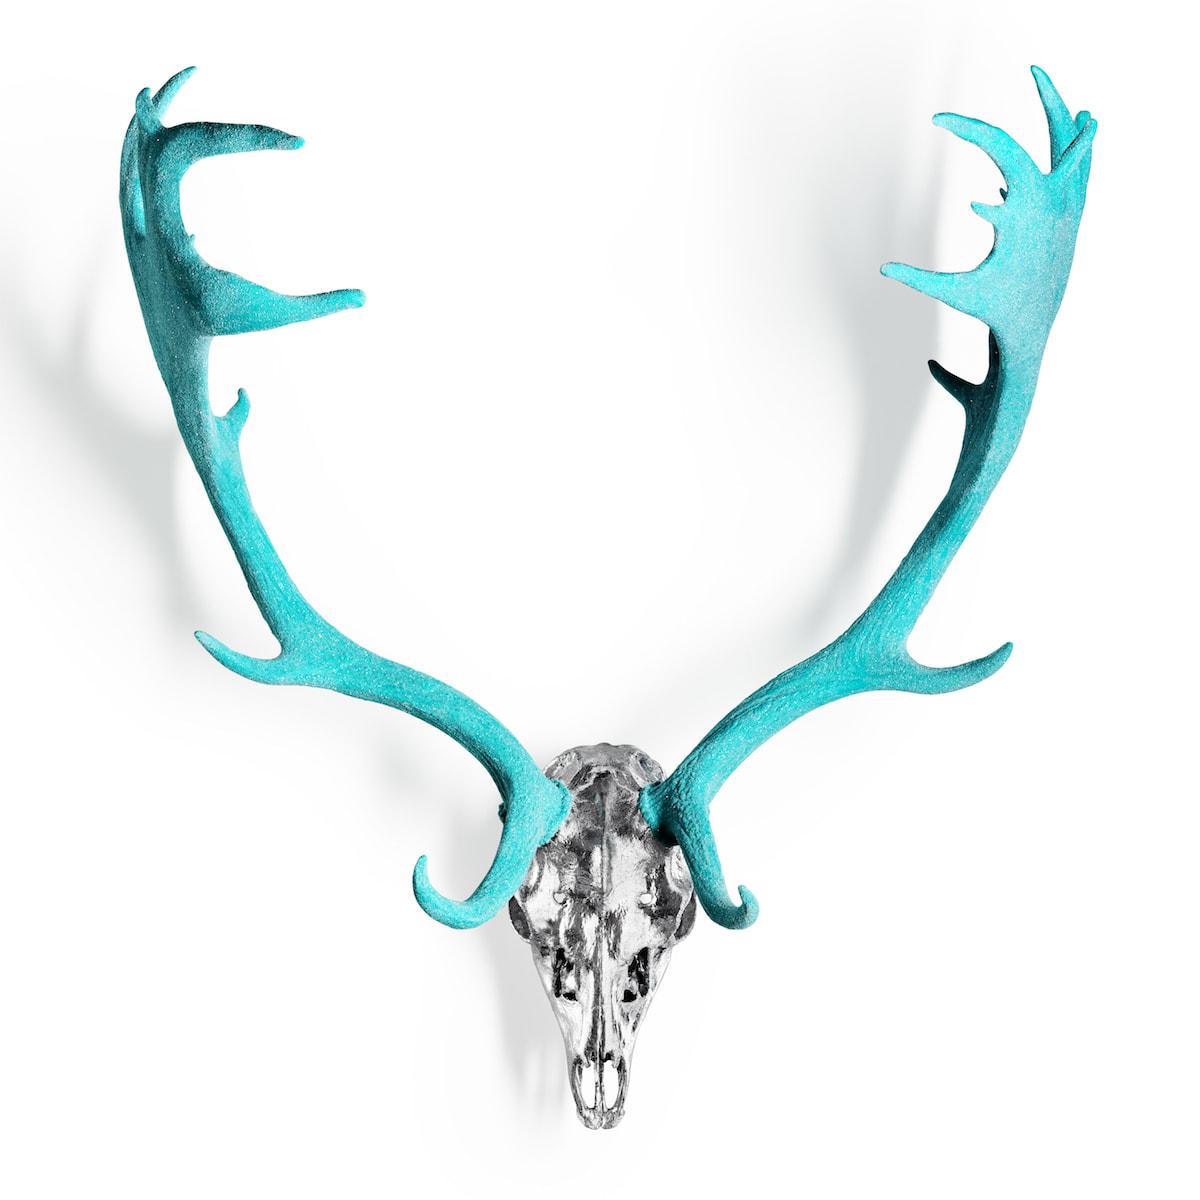 Tiffany Diamond Dust Fallow Deer - Large